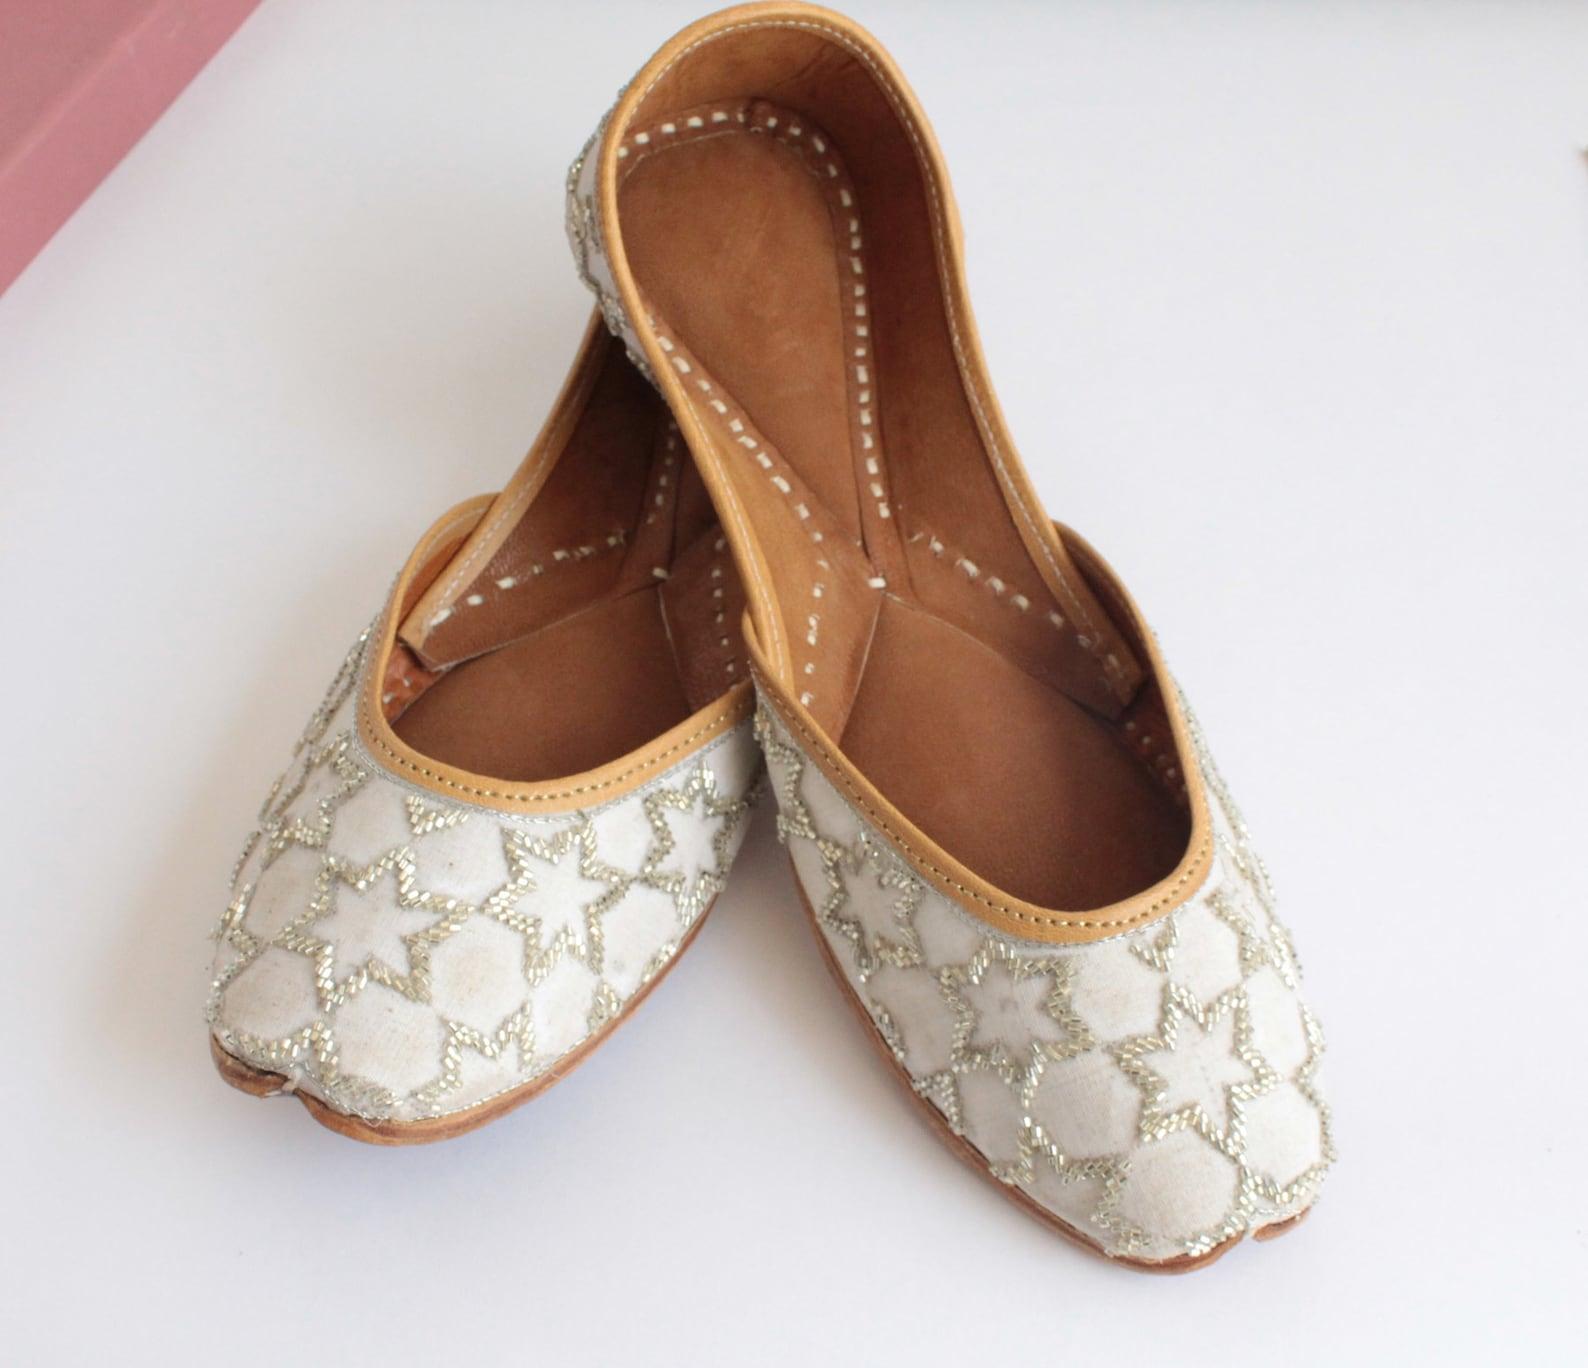 white shoes/women bridal wedding silver star jutti shoes/punjabi flats/silver ballet flats/khussa shoes/fancy juti shoes/